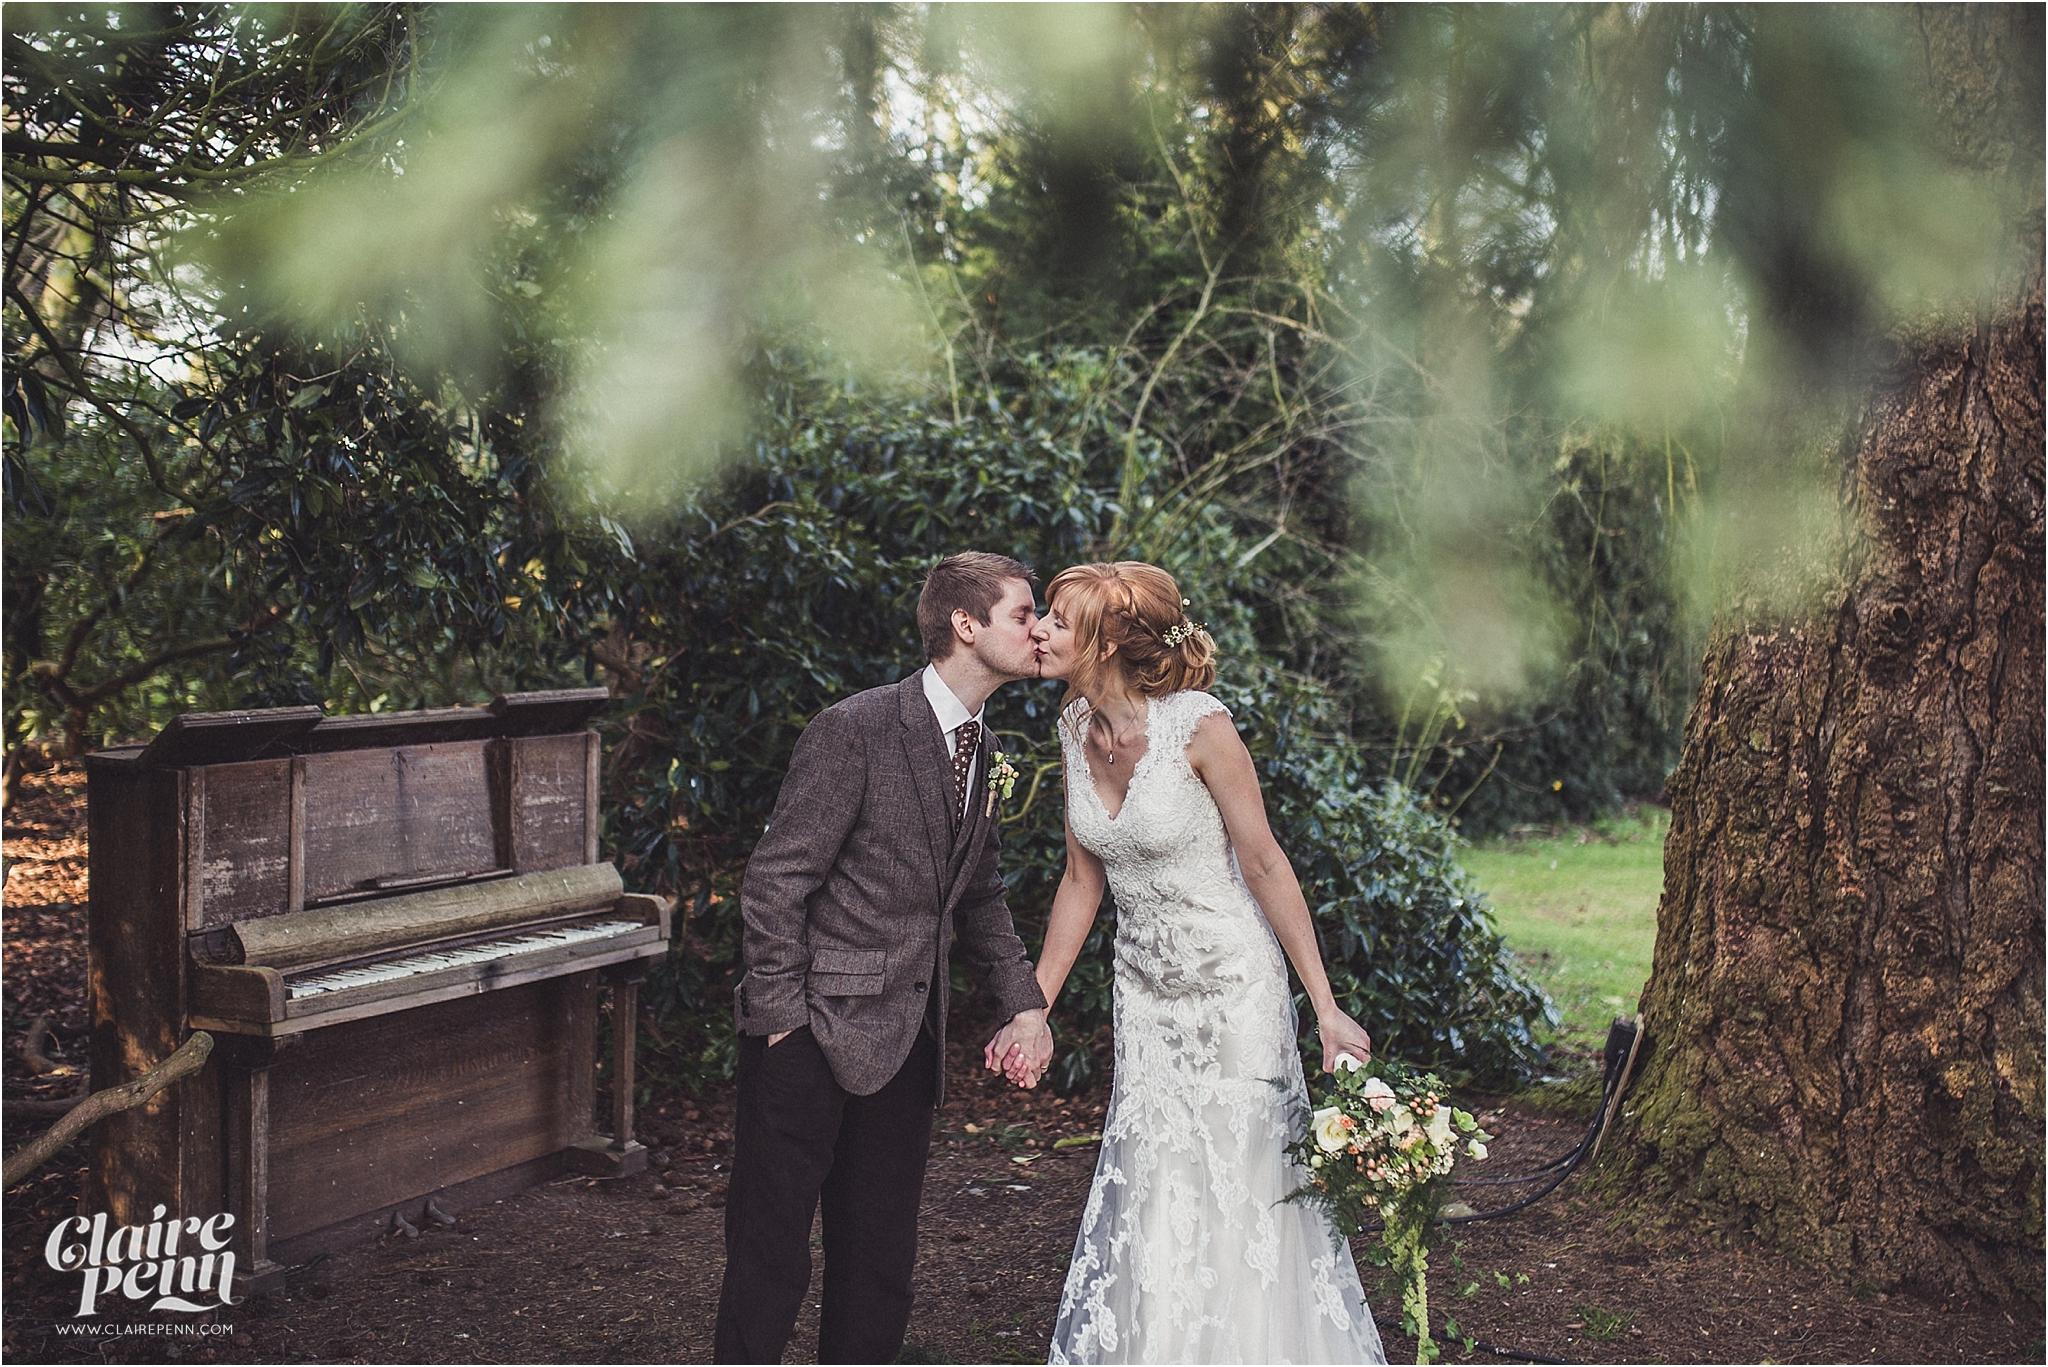 Iscoyd Park wedding, Whitchurch, Cheshire wedding photographer_0038.jpg